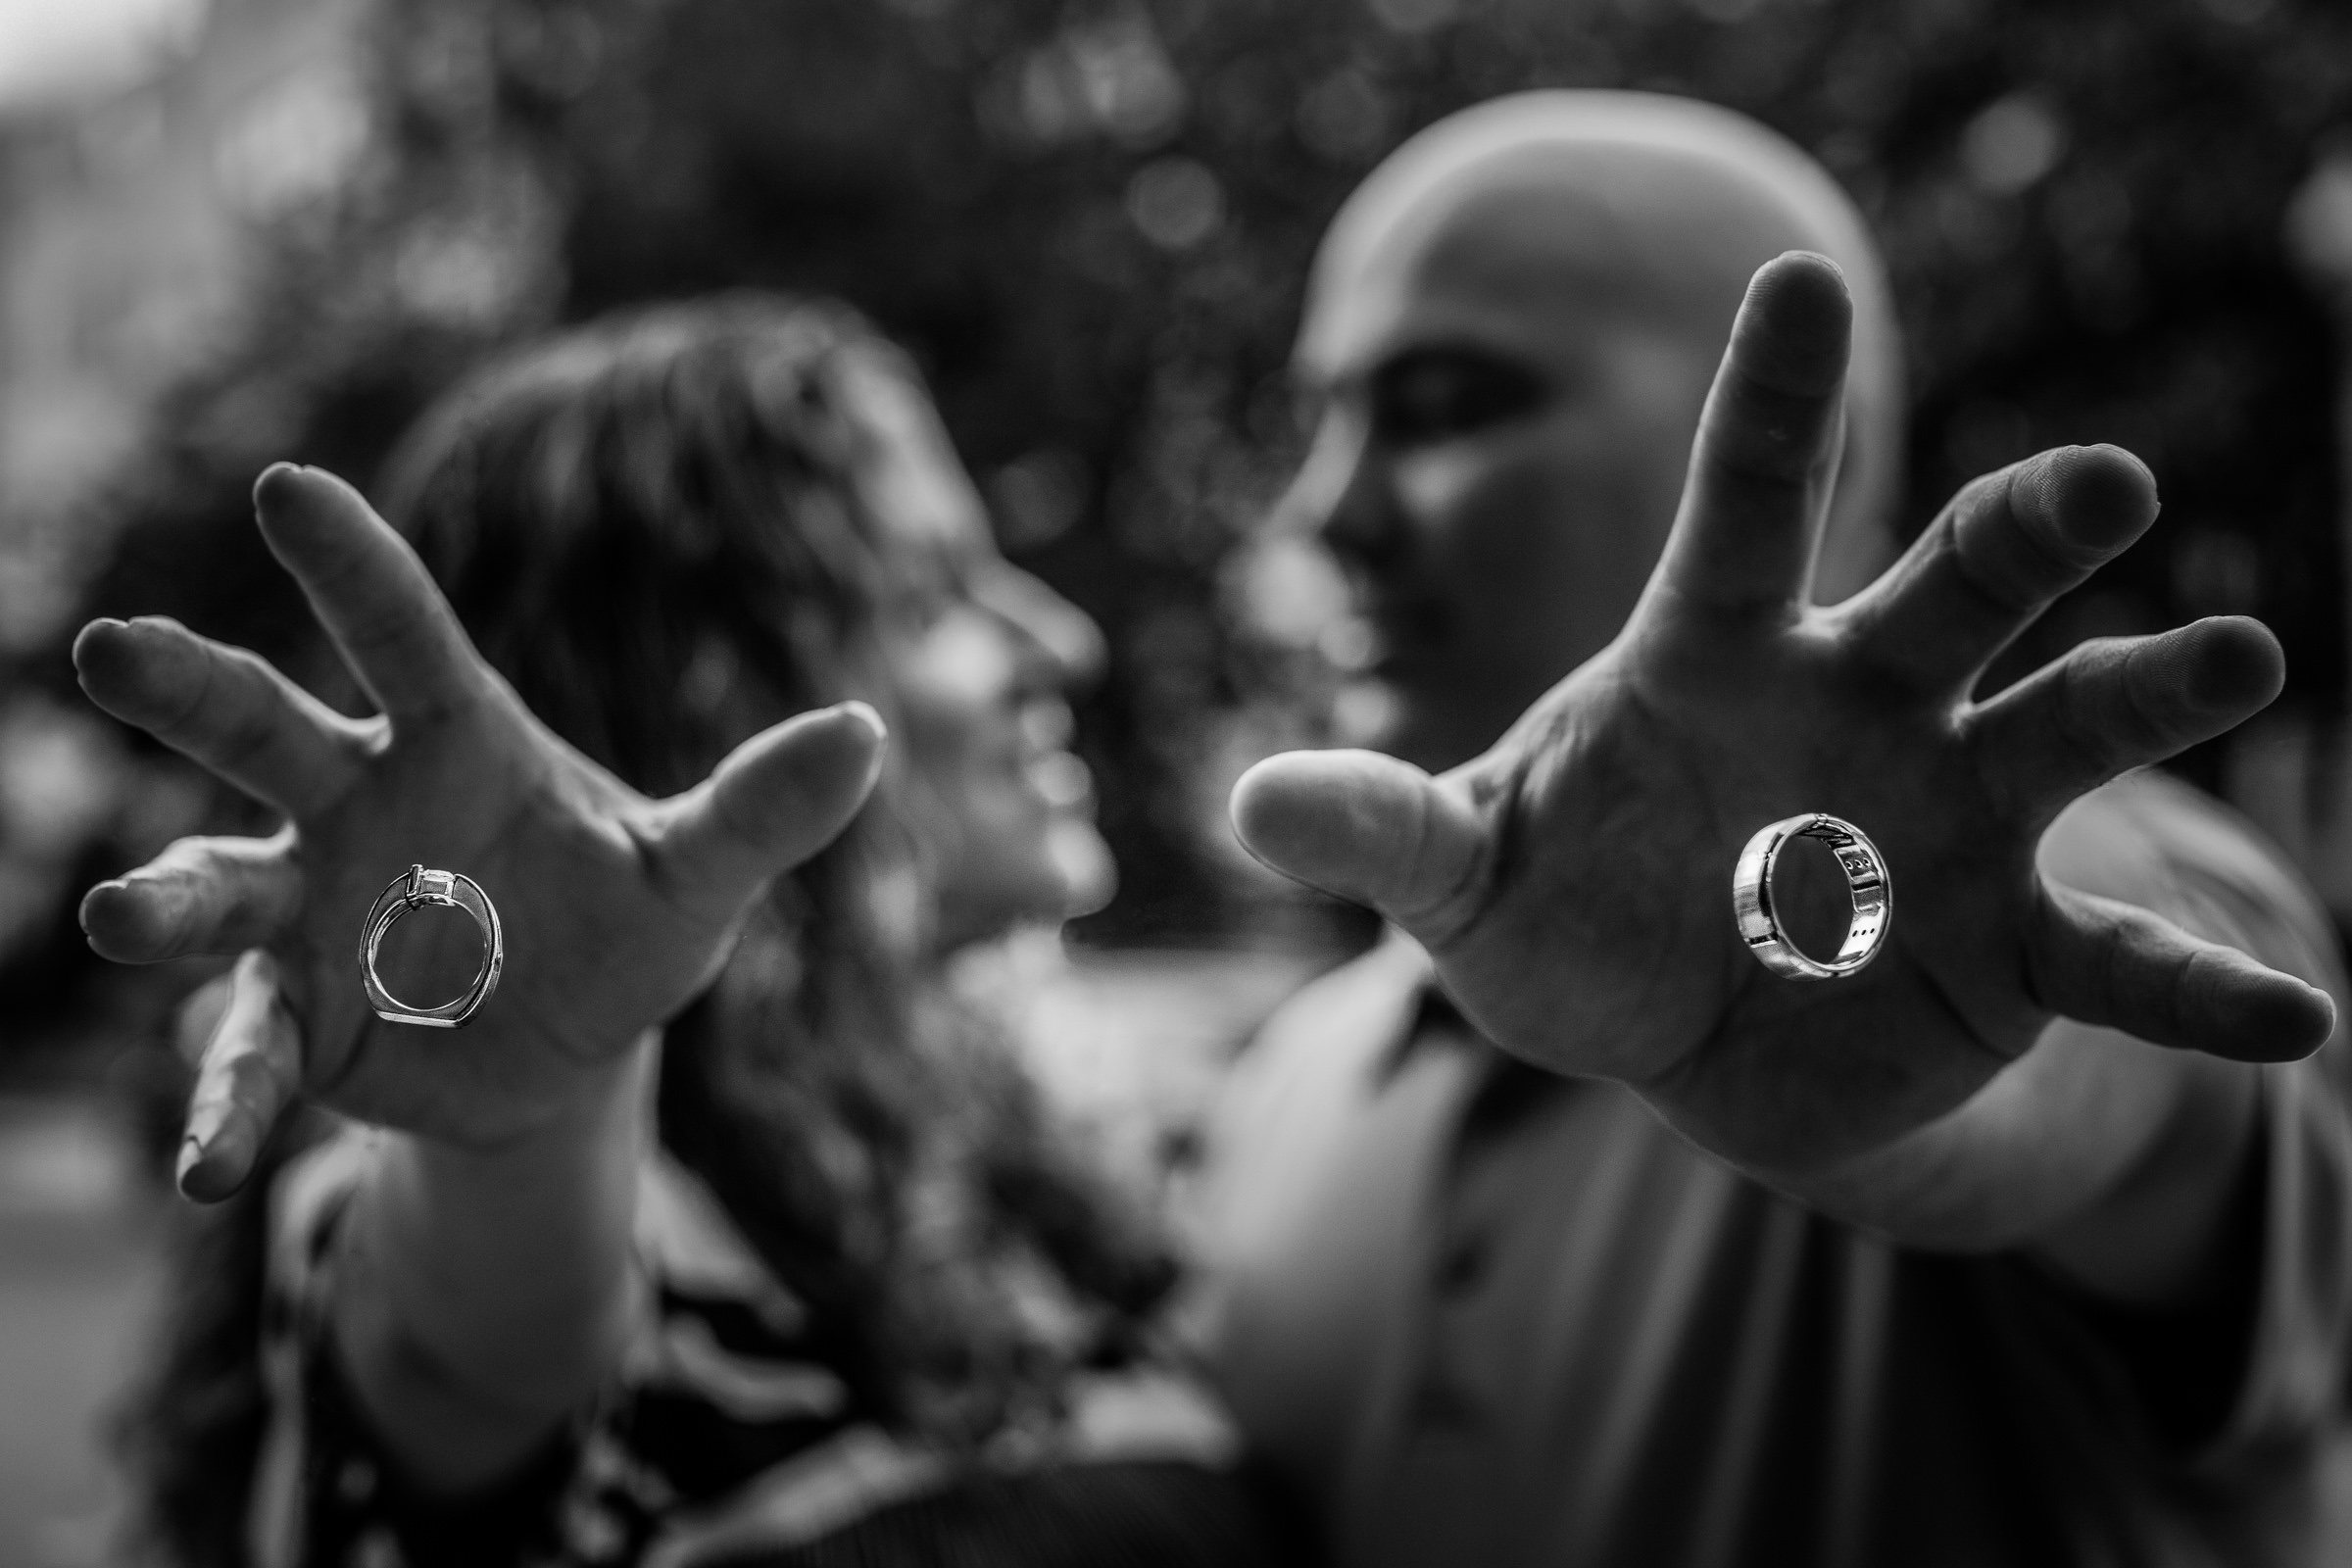 rings-in-motion-from-hands-of-groom-nat-wongsaroj-photography